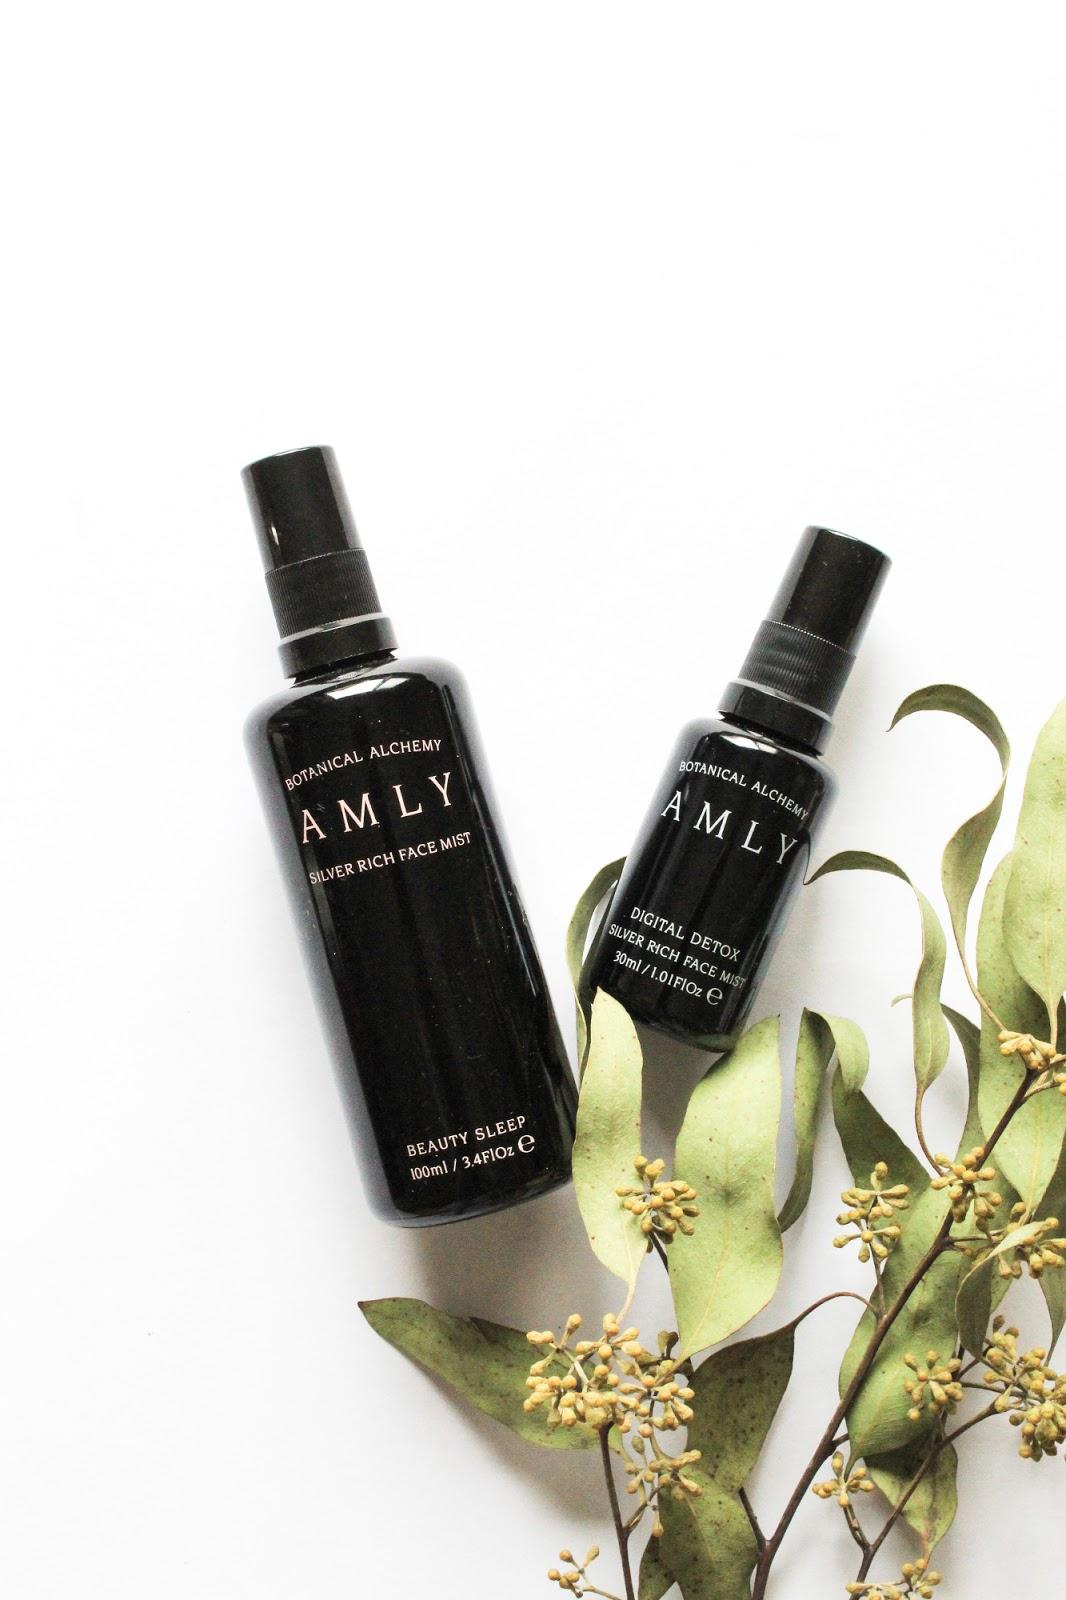 Amly Botanicals Beauty Sleep and Digital Detox Silver Rich Face Mists